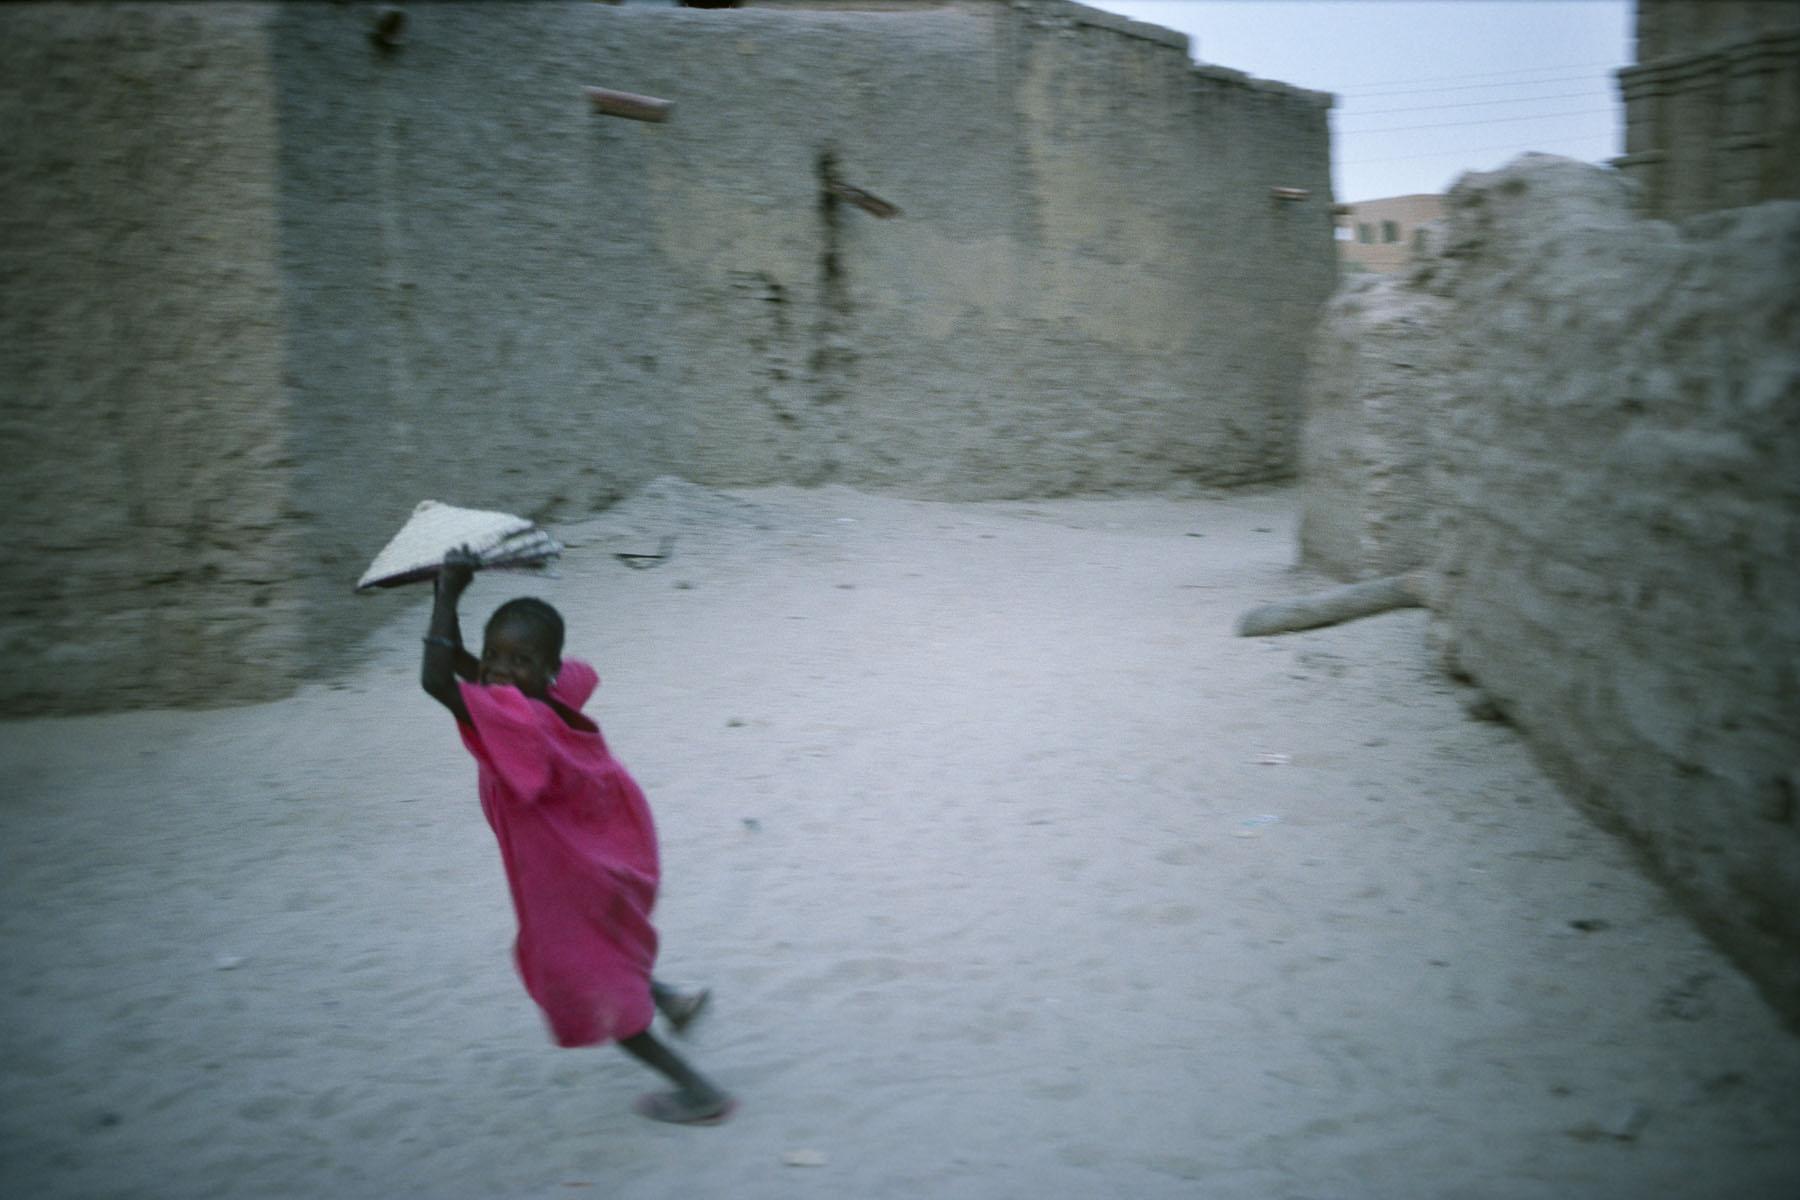 Timbuktu street in 1995